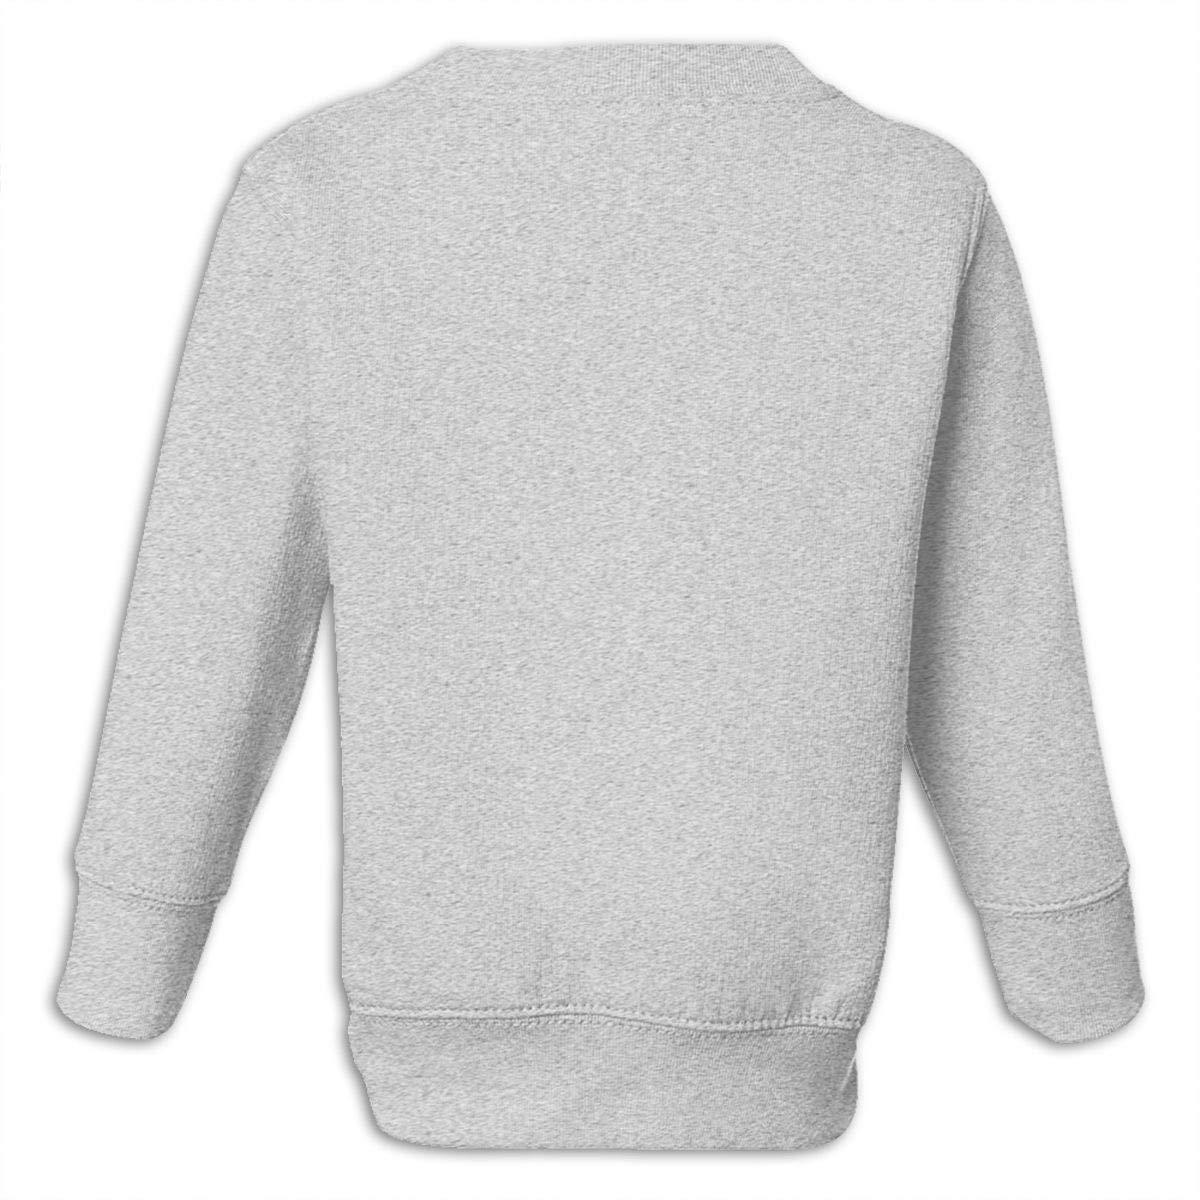 NMDJC CCQ Bye Buddy Christmas Baby Sweatshirt Cute Juvenile Hoodies Cotton T Shirts